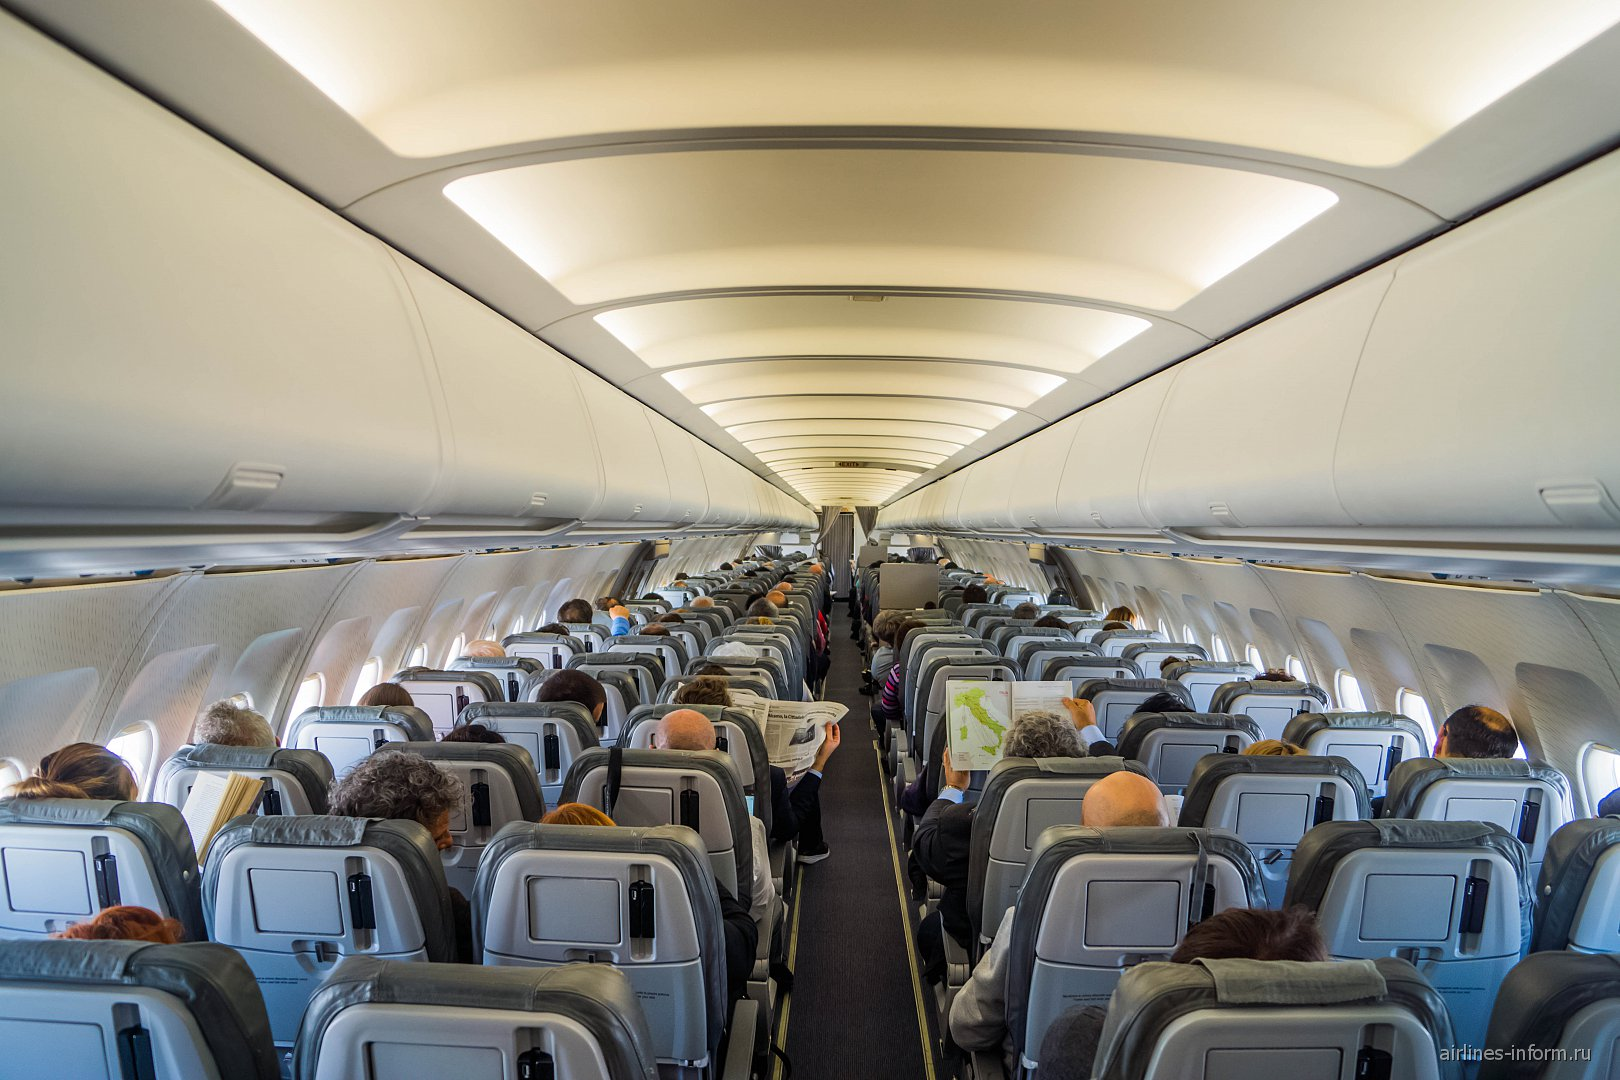 Пассажирский салон самолета Airbus A321 авиакомпании Alitalia